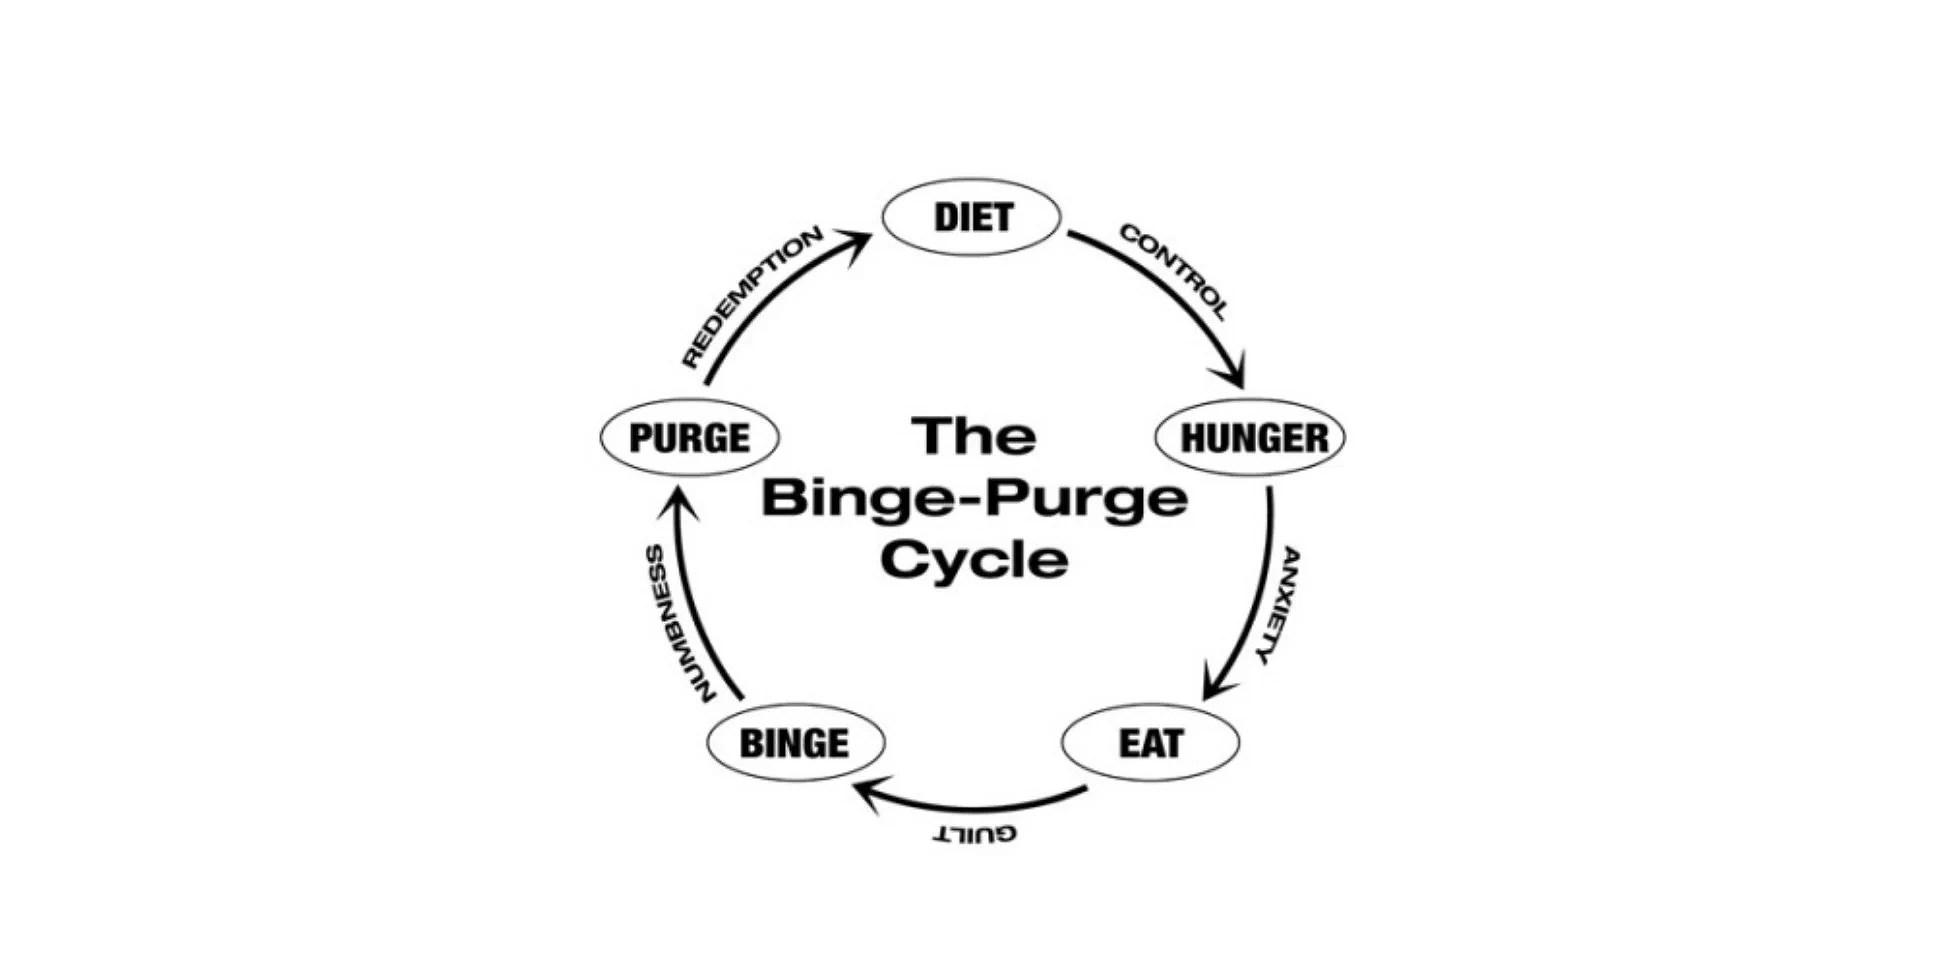 Bulimi og spiseproblematikk i julen